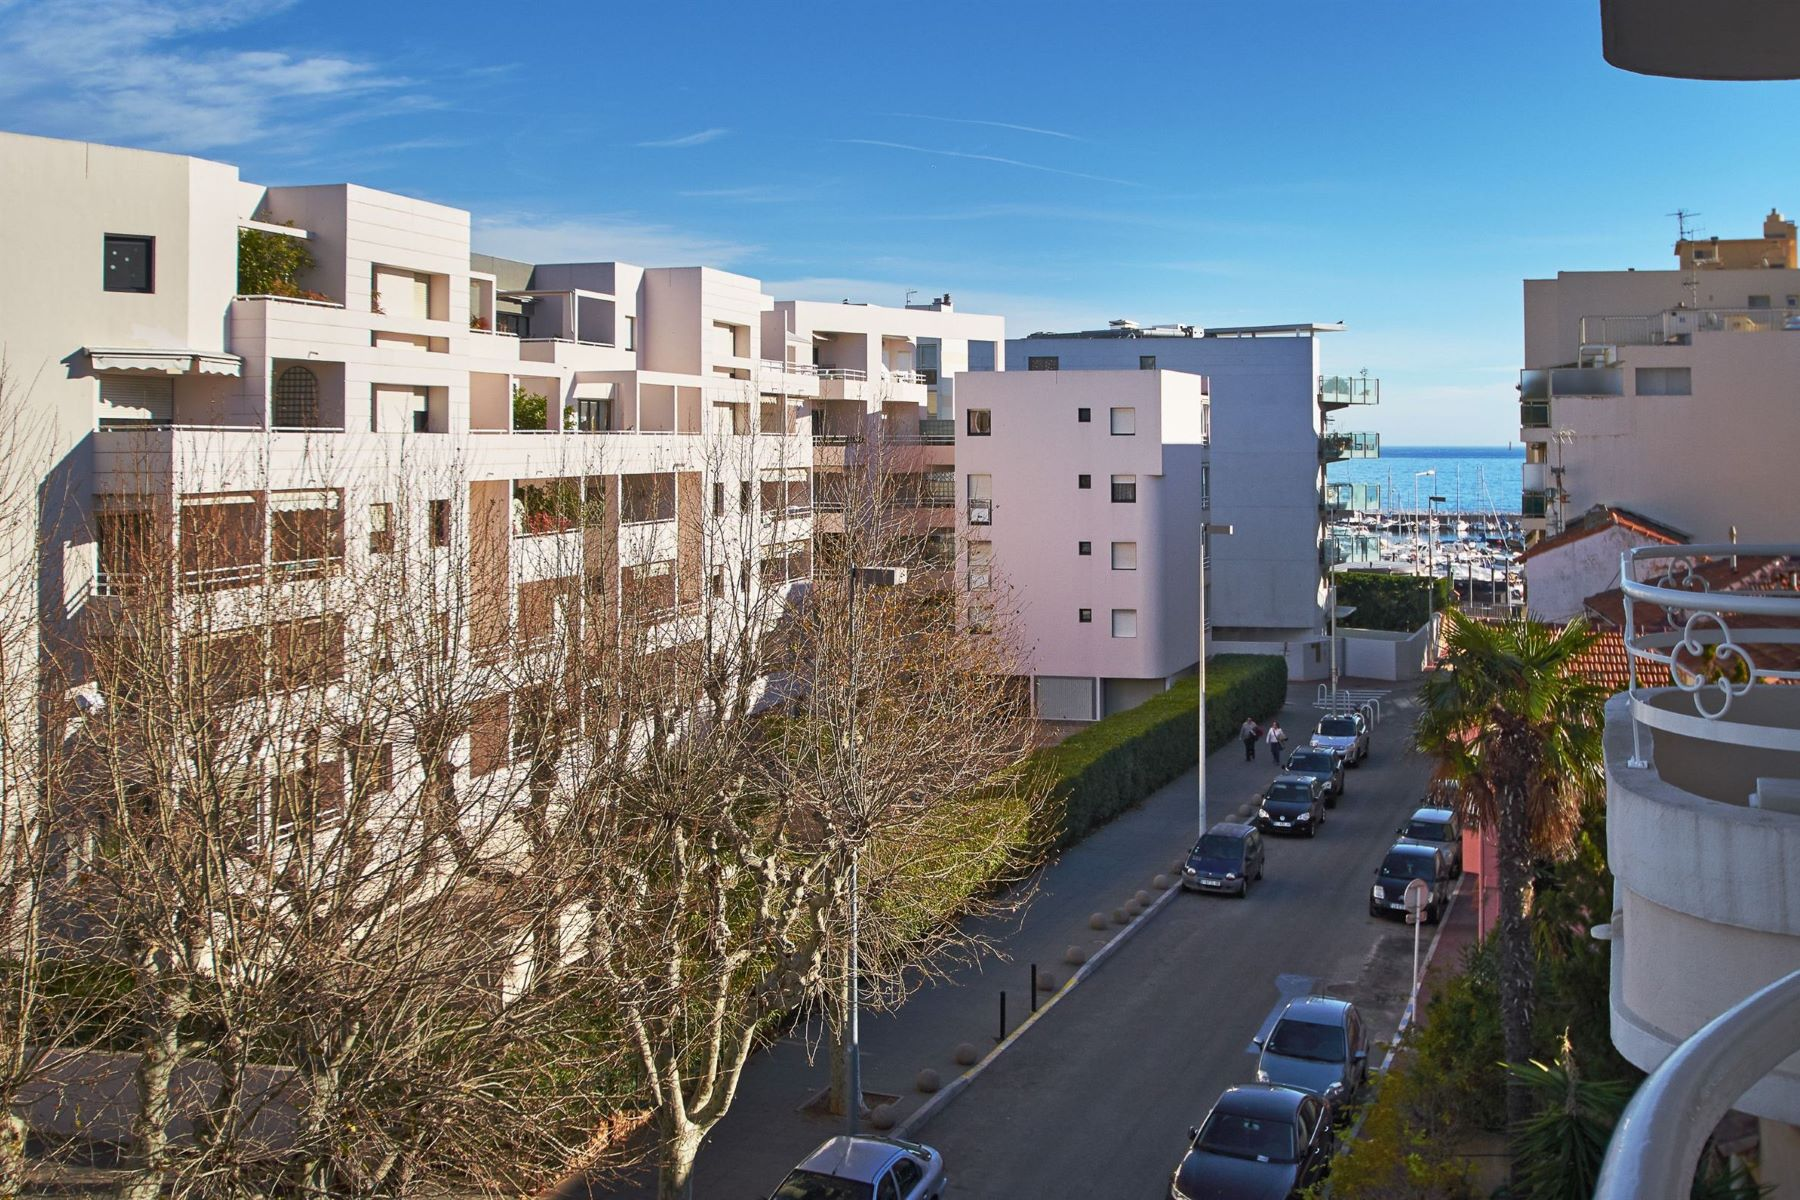 Квартира для того Продажа на 2 beds apartement for sale in Cannes Palm Beach Cannes, Прованс-Альпы-Лазурный Берег, 06400 Франция